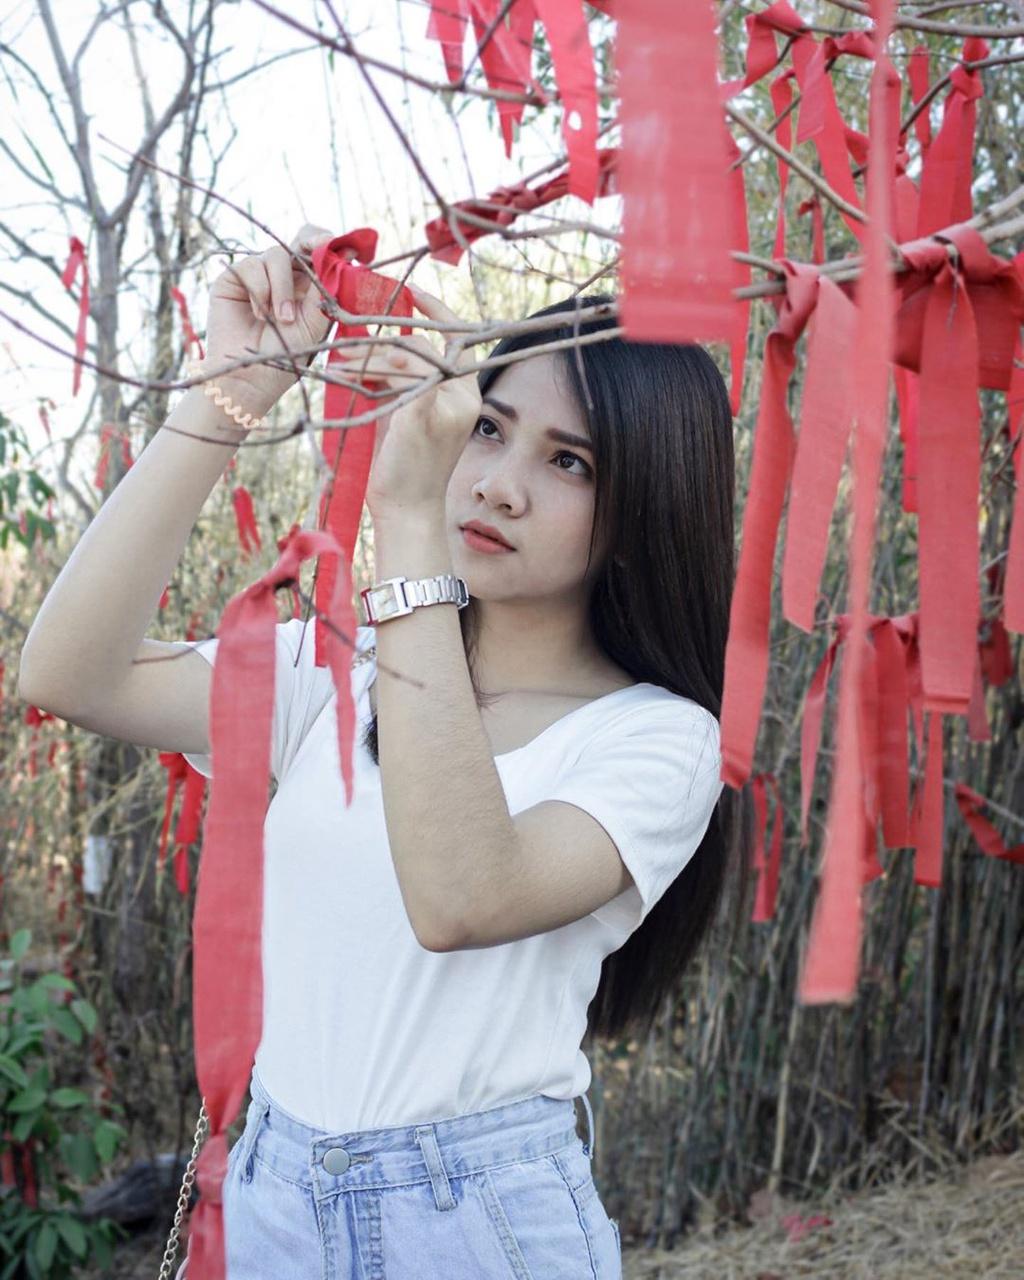 Check-in voi tuong than ran Naga khong lo o Thai Lan hinh anh 6 4pompam_sp_.jpg